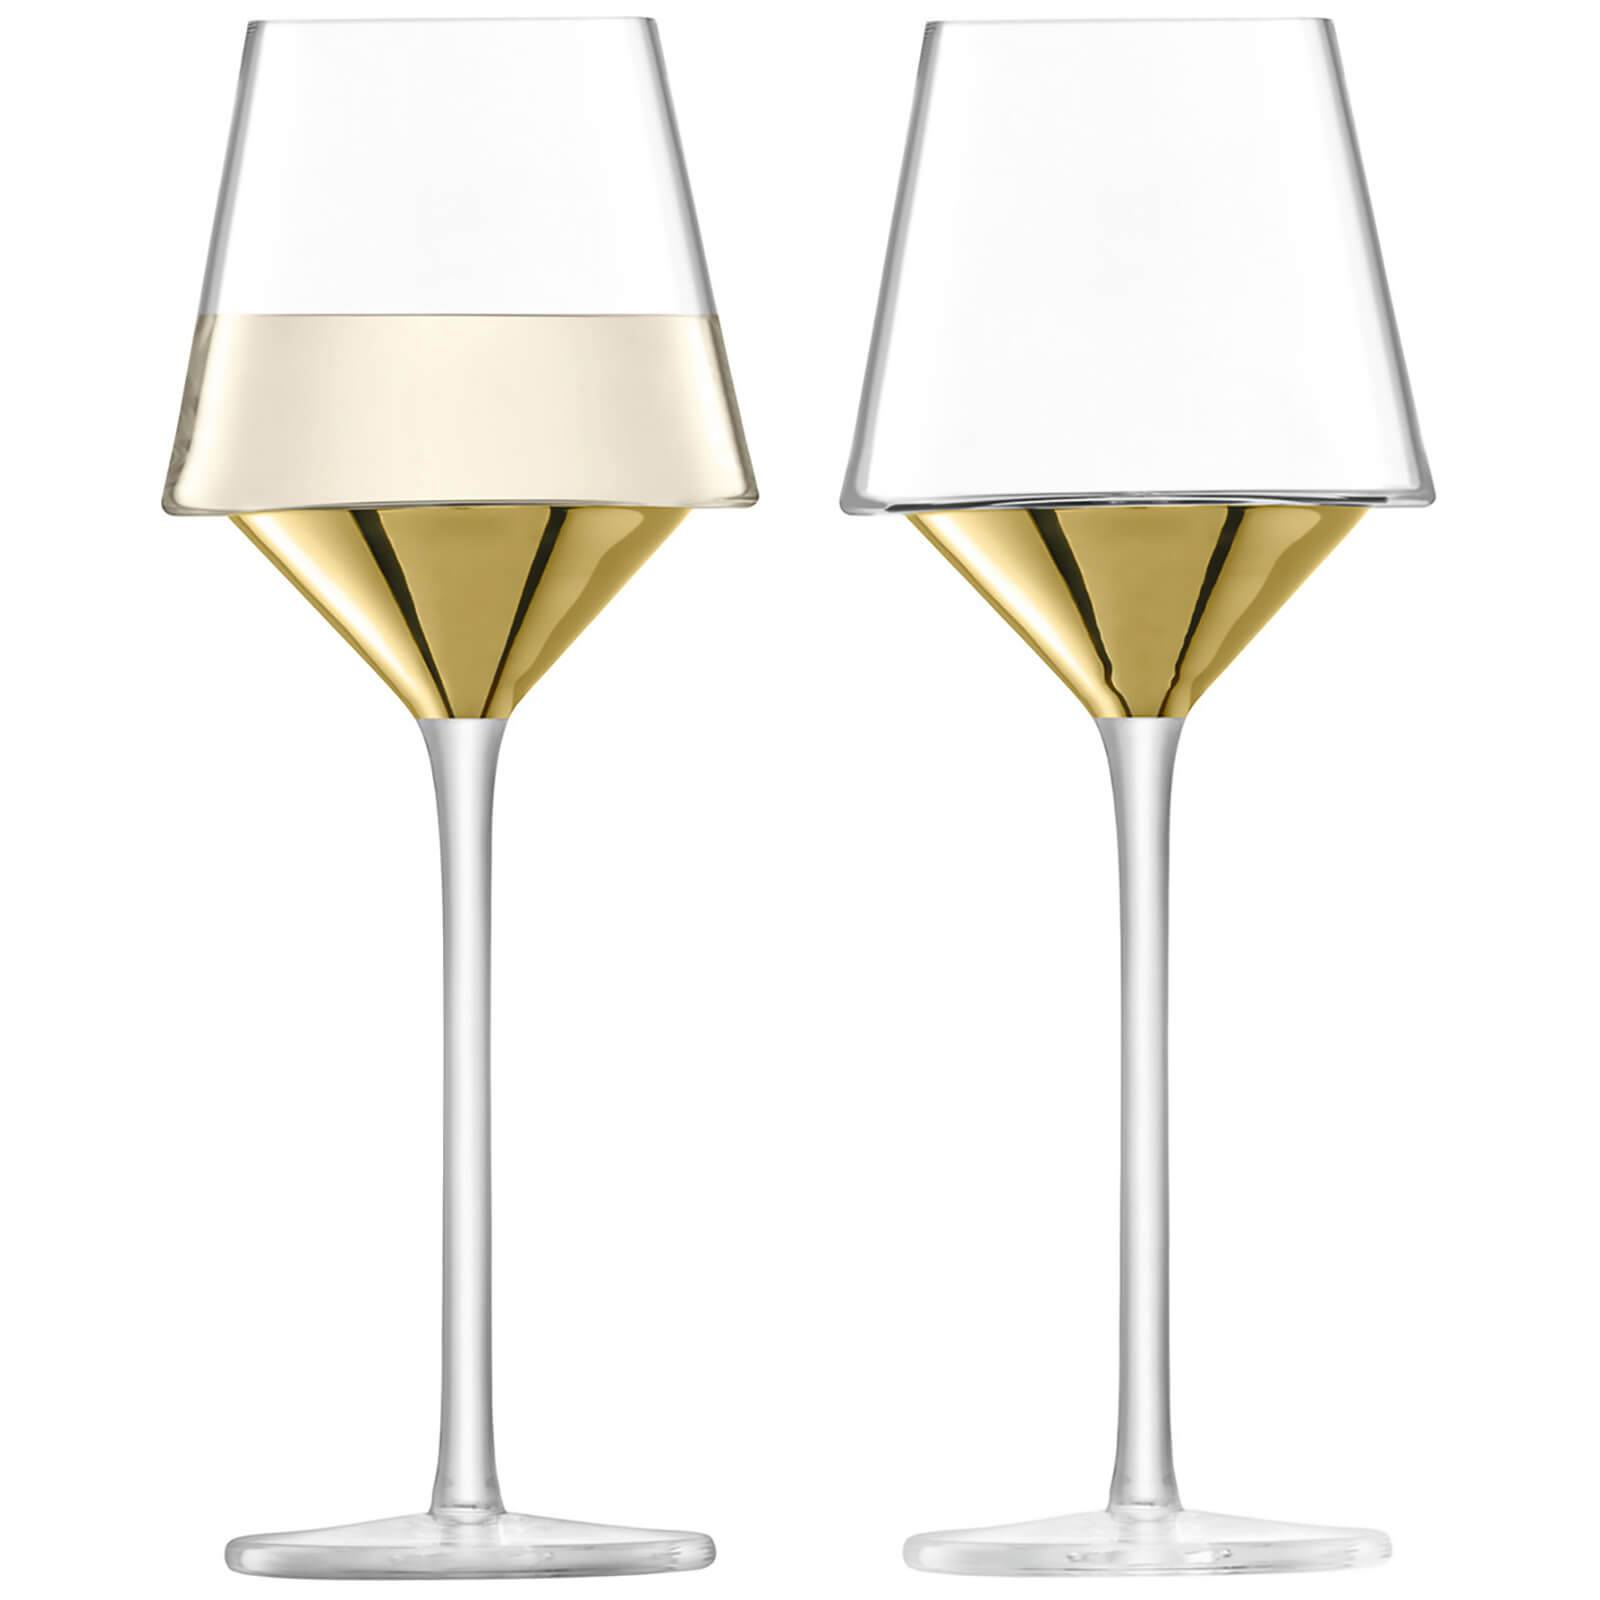 LSA International LSA Space Wine Glasses - Gold (Set of 2)